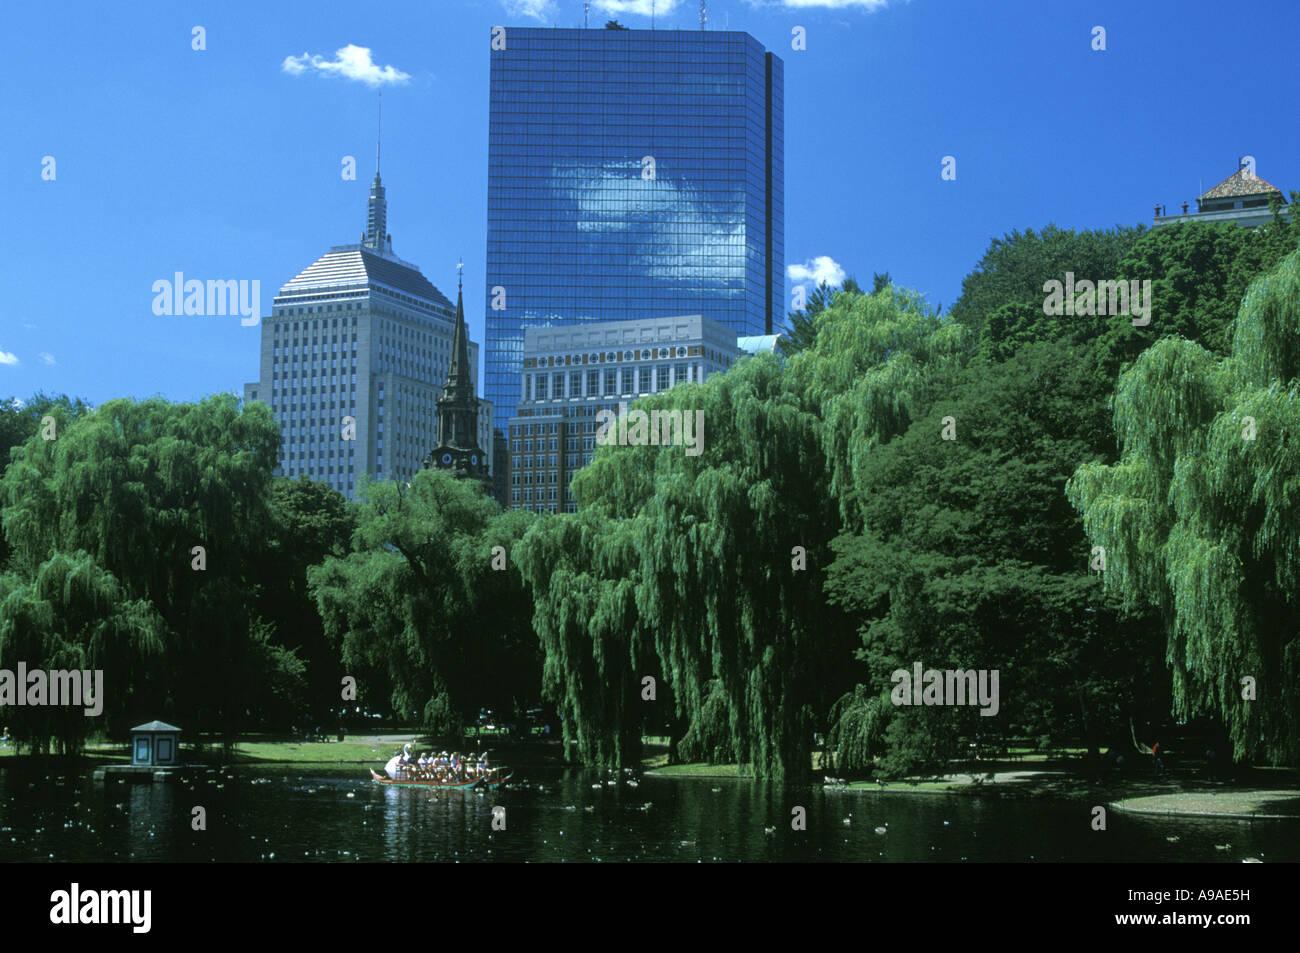 POND BOSTON PUBLIC GARDEN BOSTON  MASSACHUSSETTS USA - Stock Image